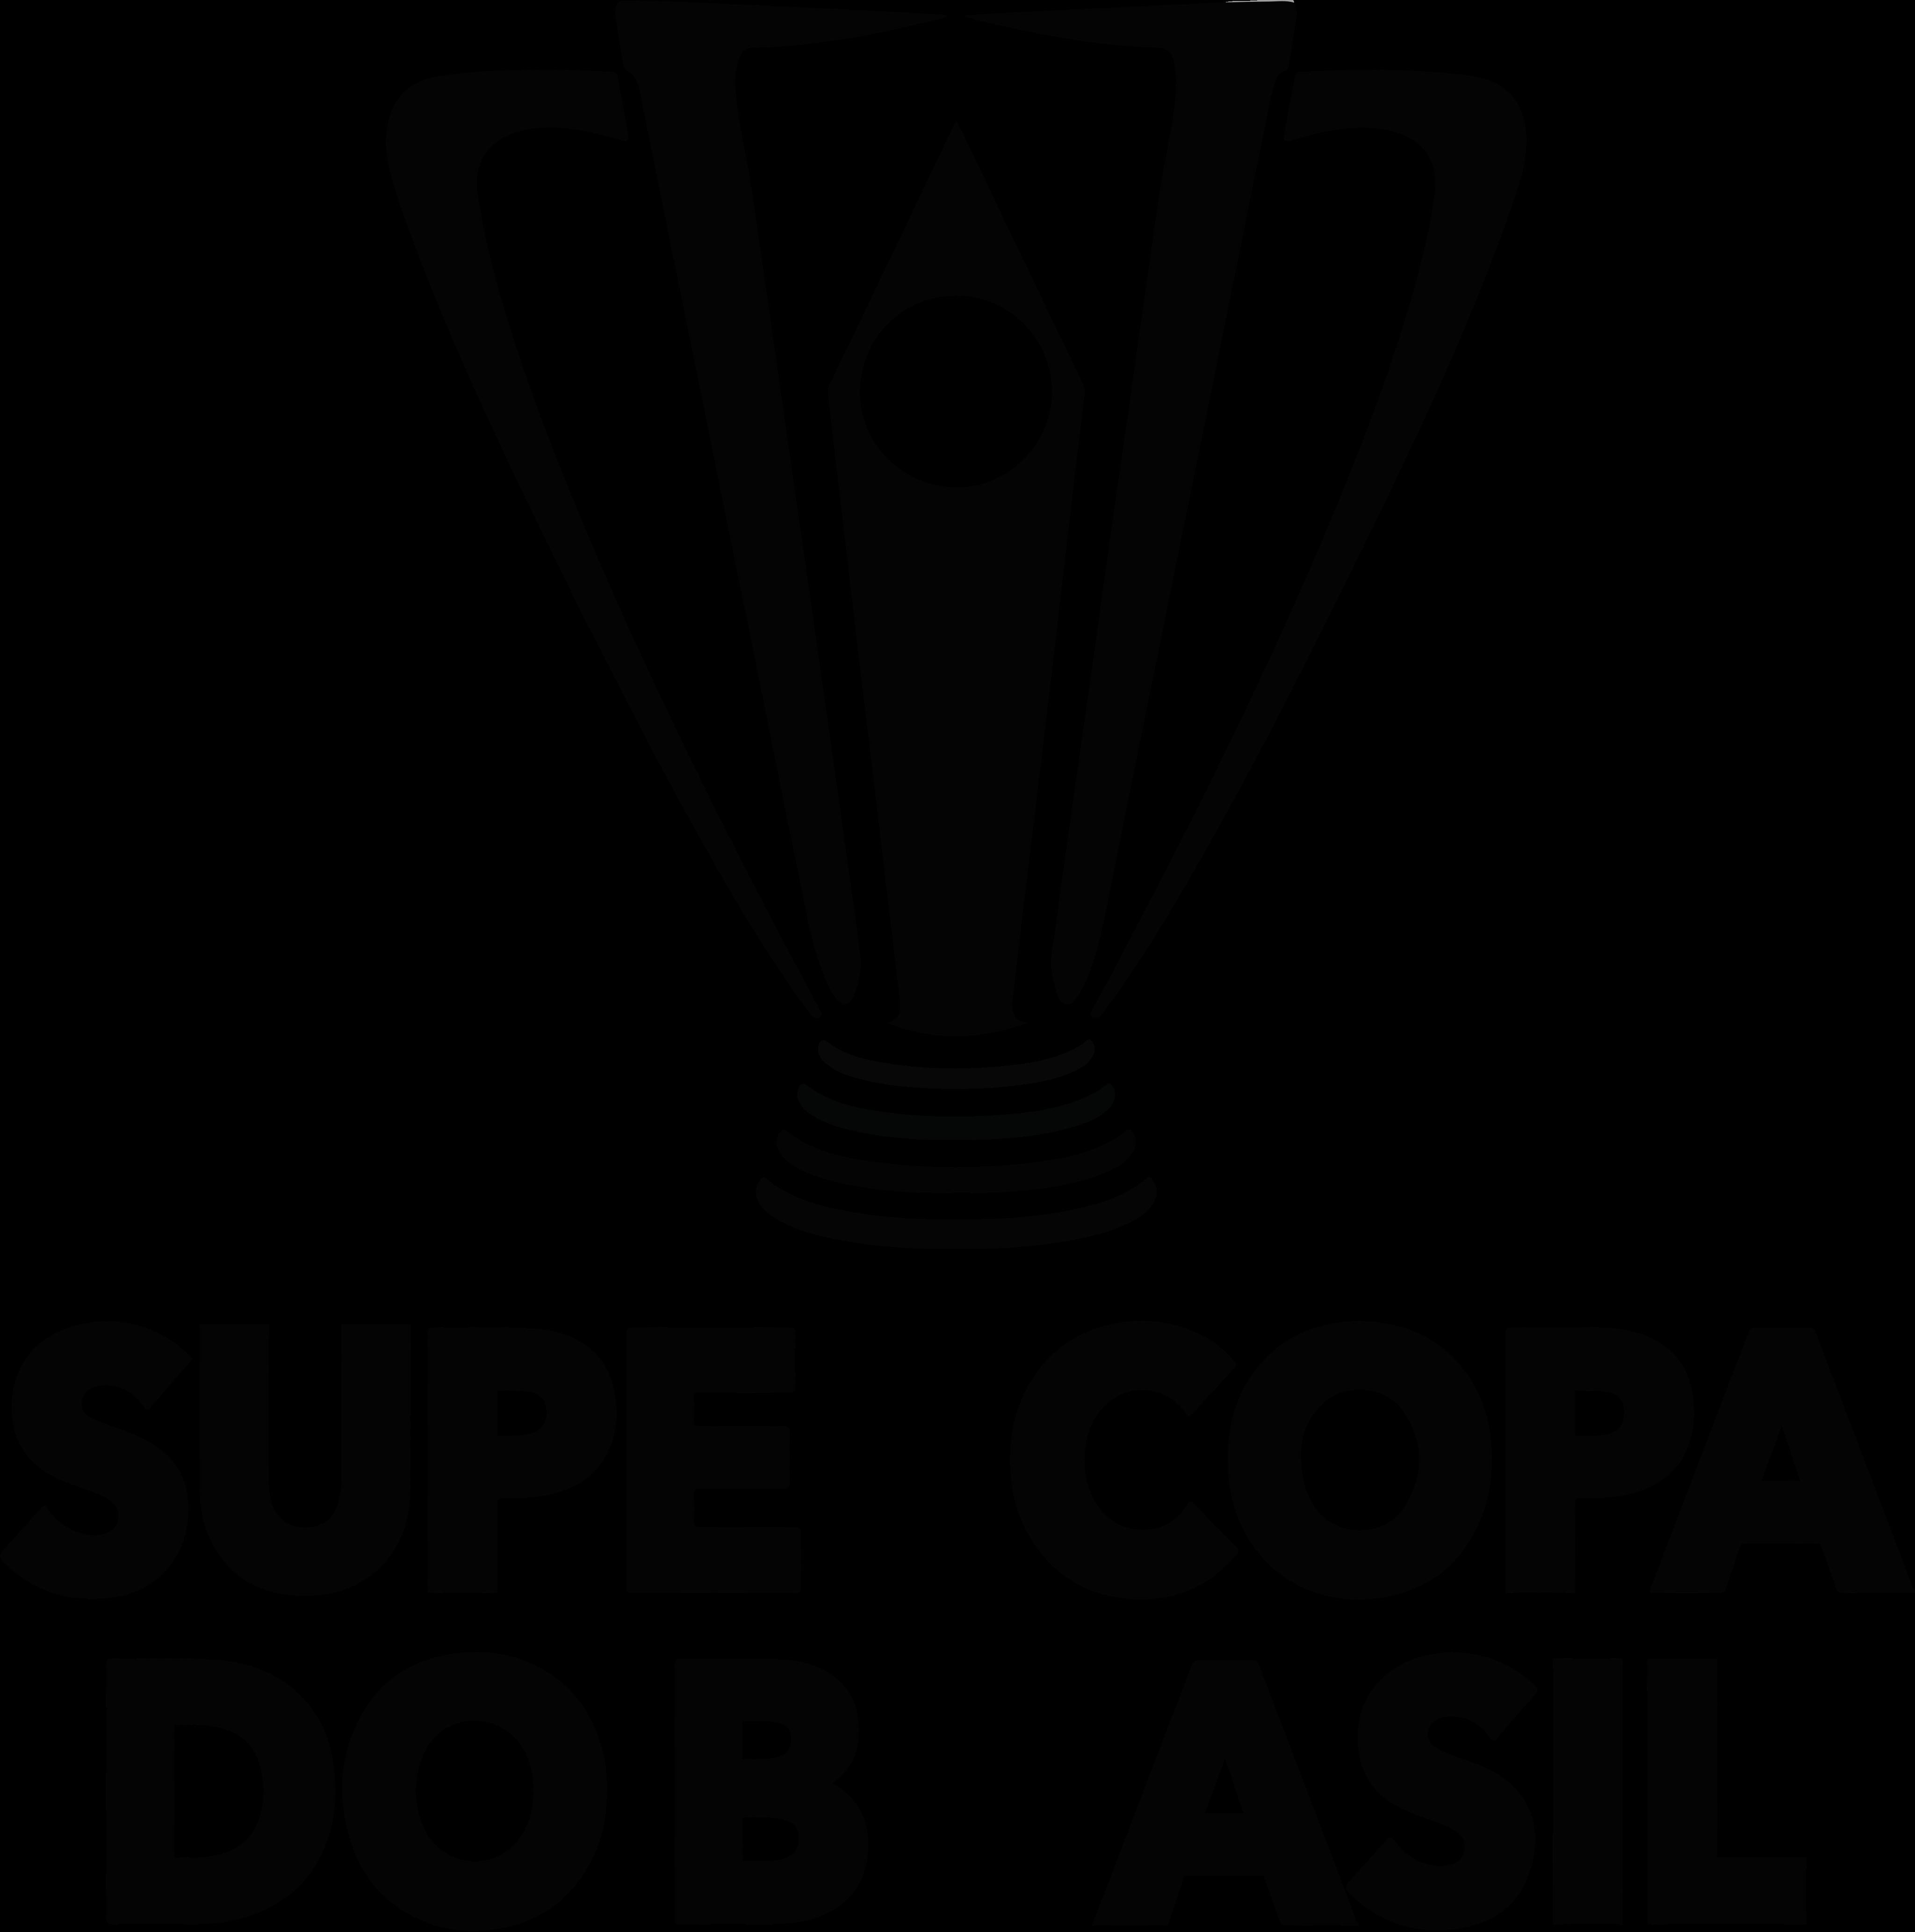 supercopa do brasil logo - Supercopa Do Brasil Logo